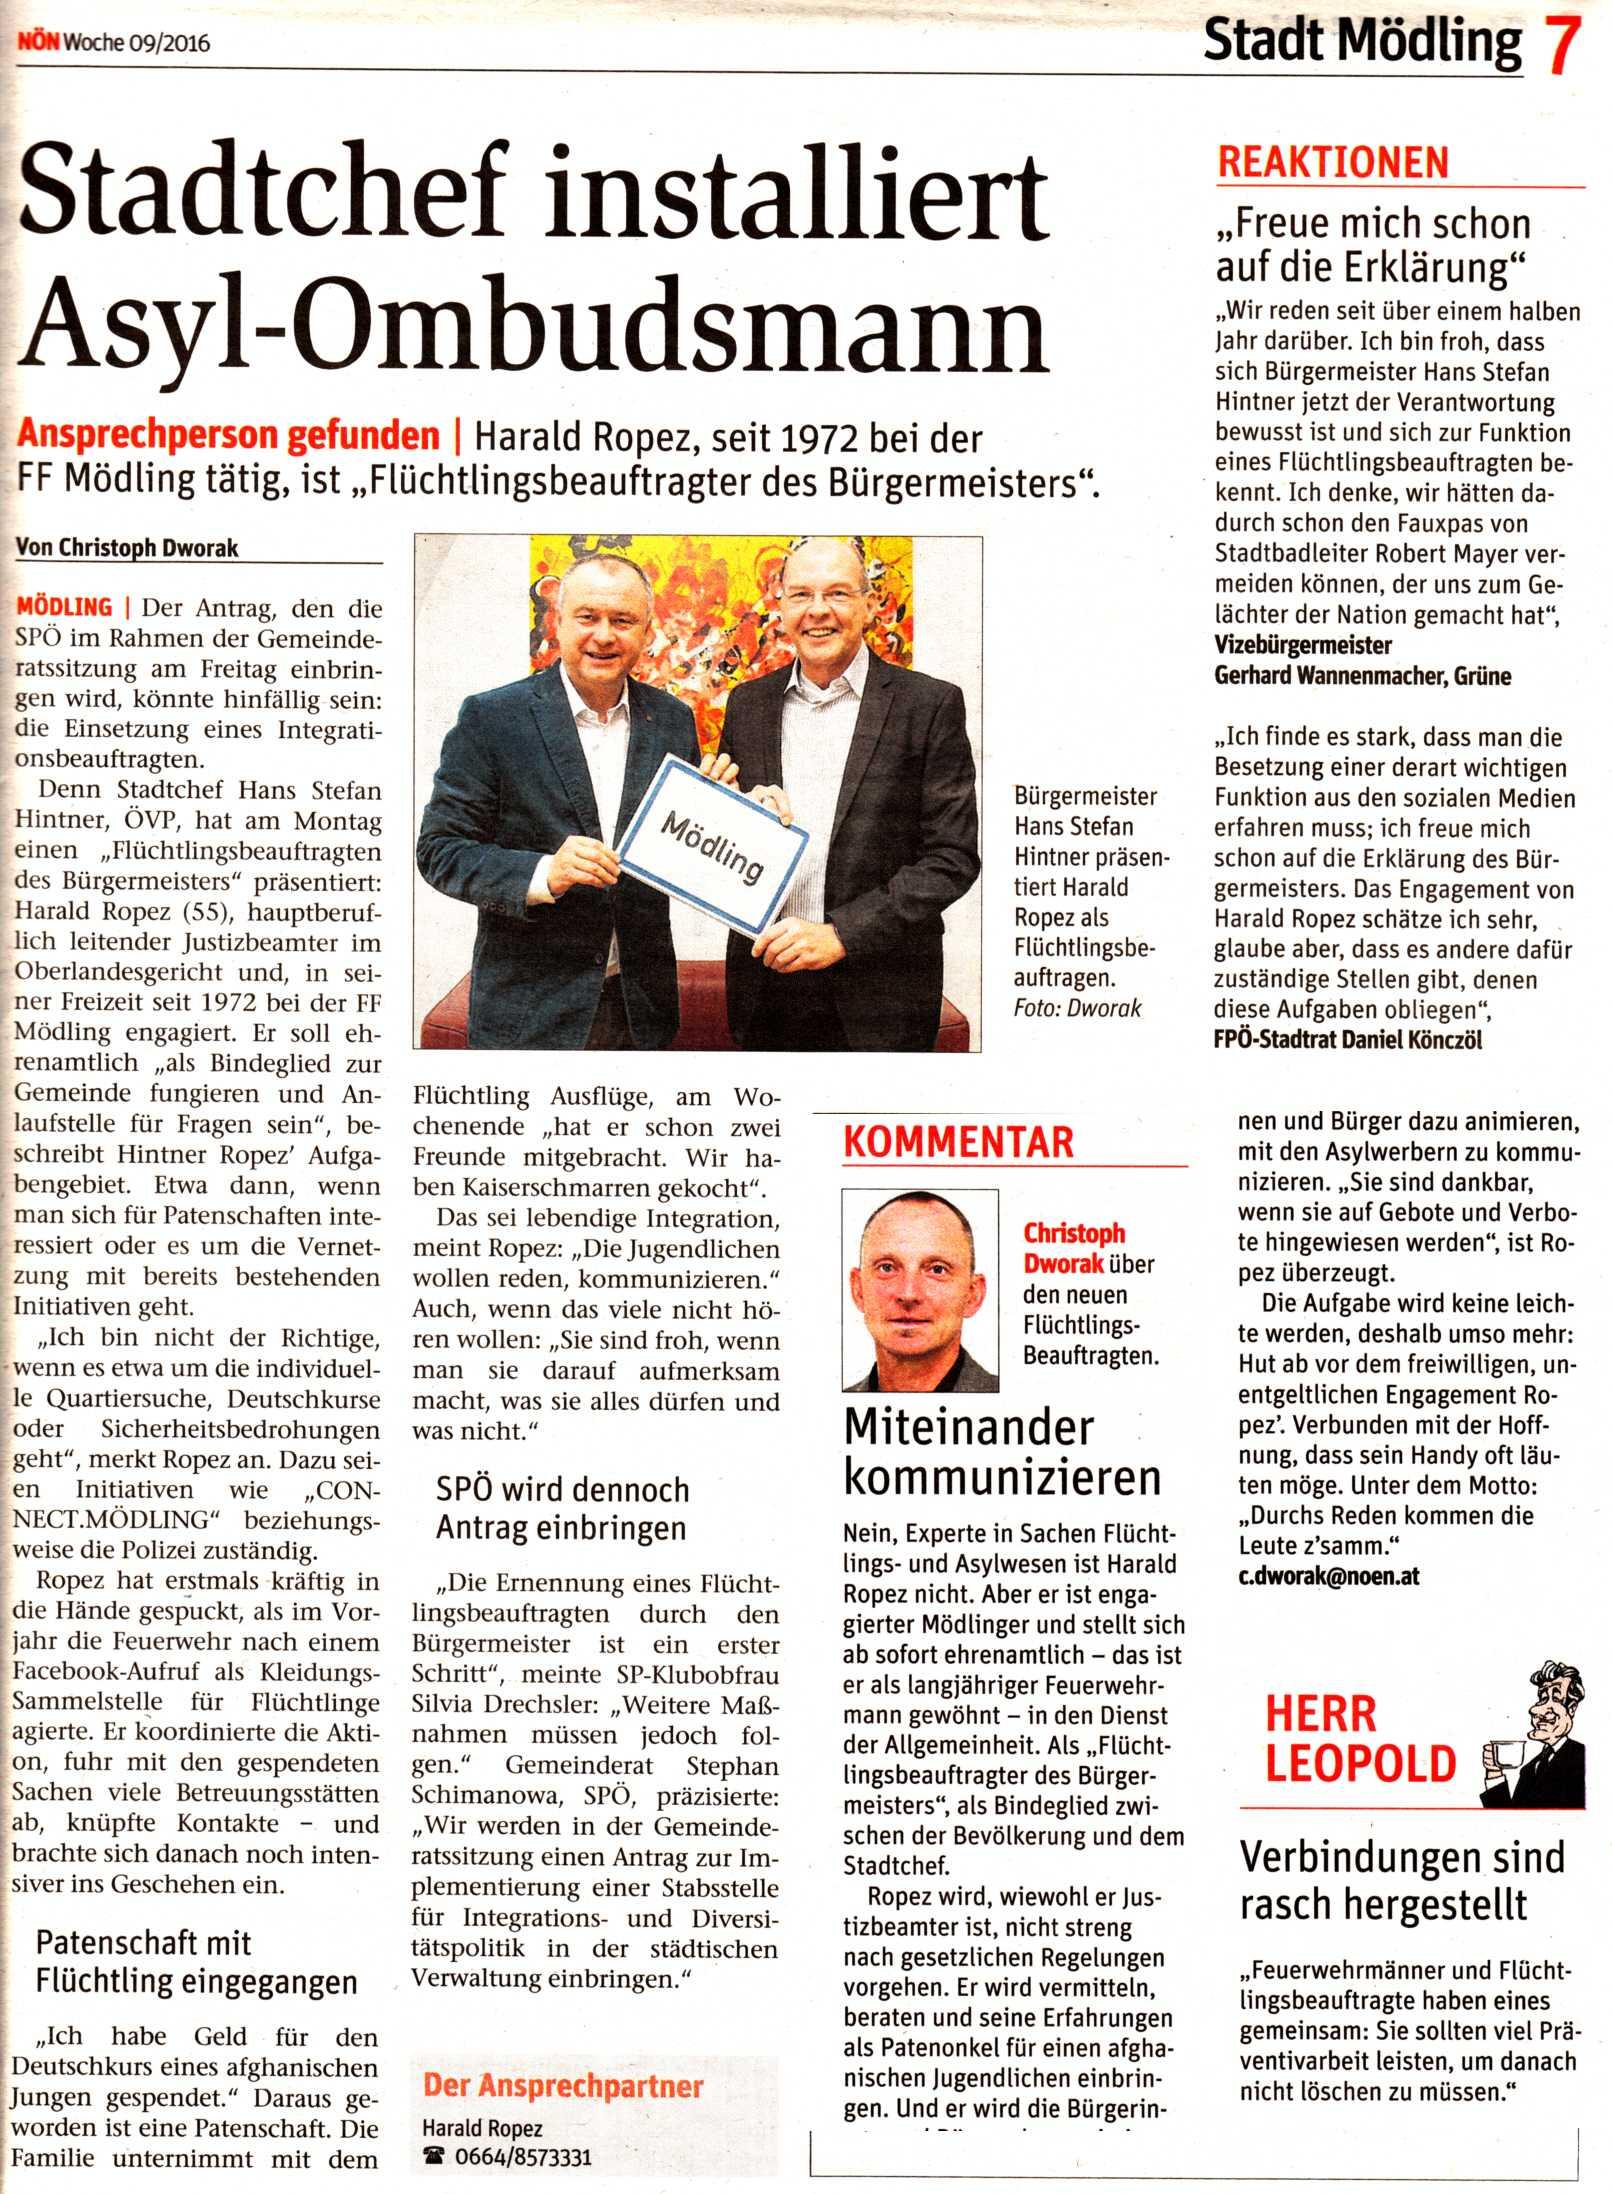 NOeN 09-2016 - Asyl-Ombudsmann